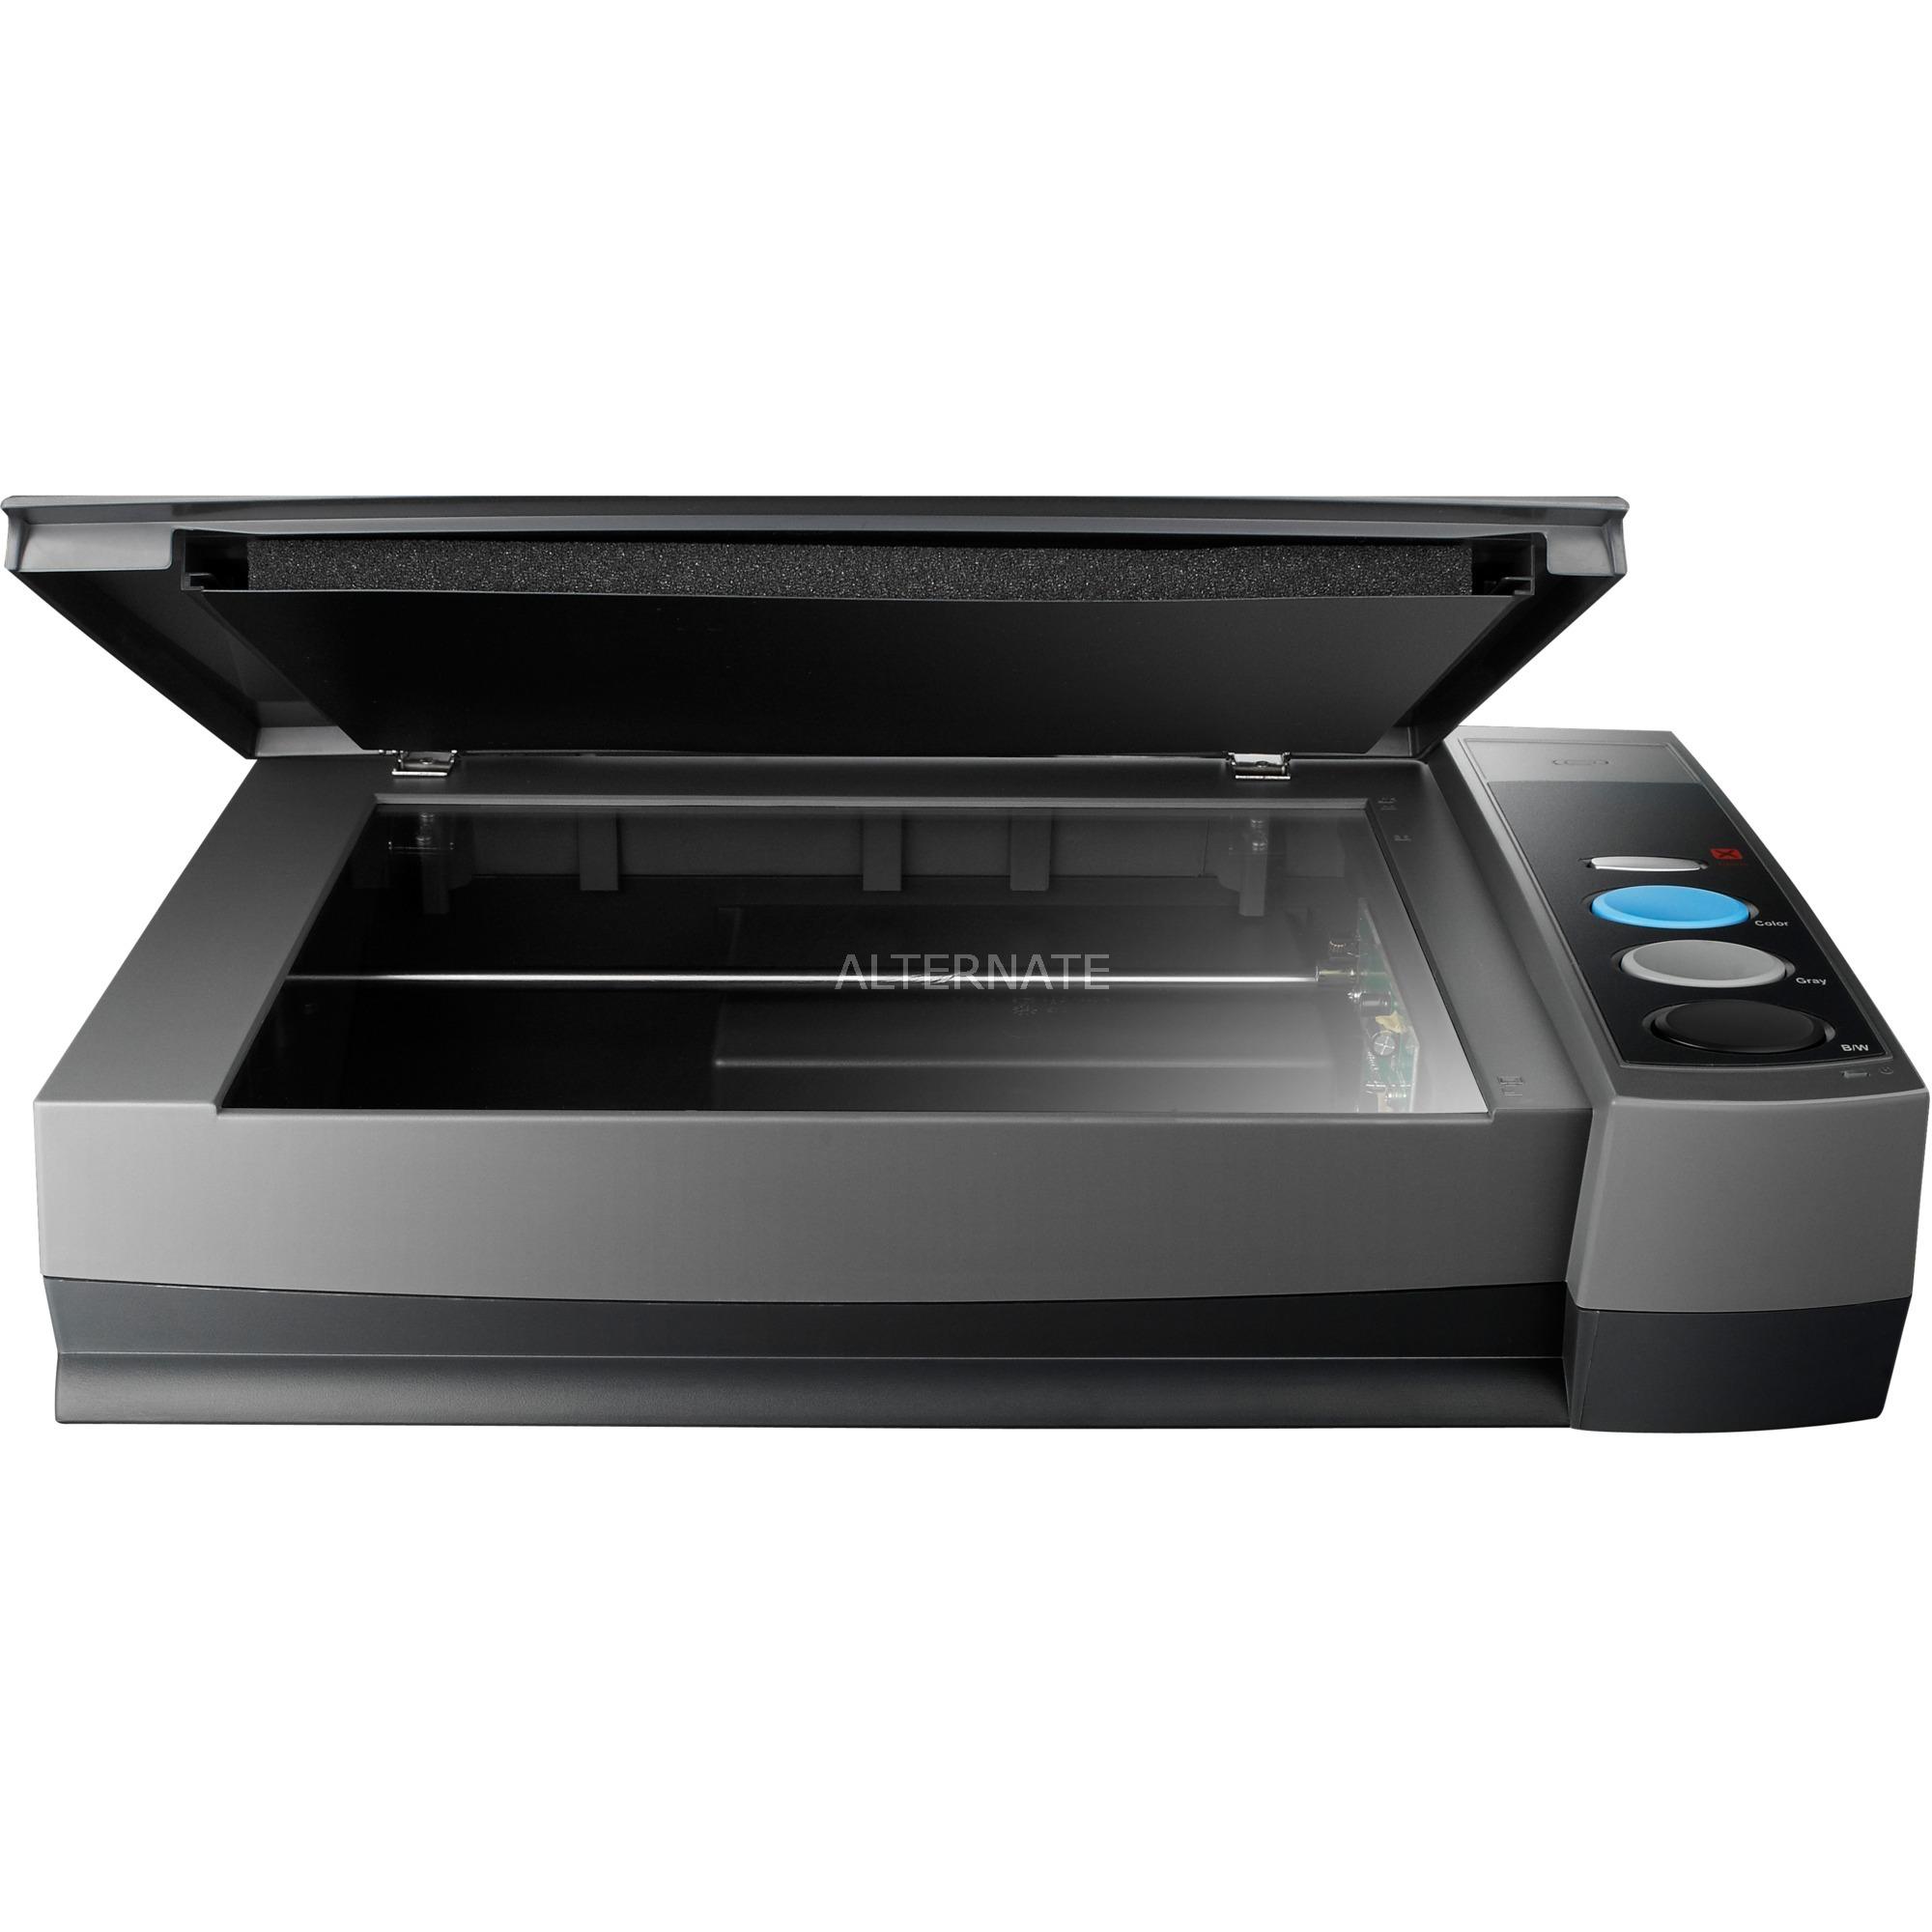 OpticBook 3900 1200 x 1200 DPI Escáner de cama plana Negro A4, Escáner plano